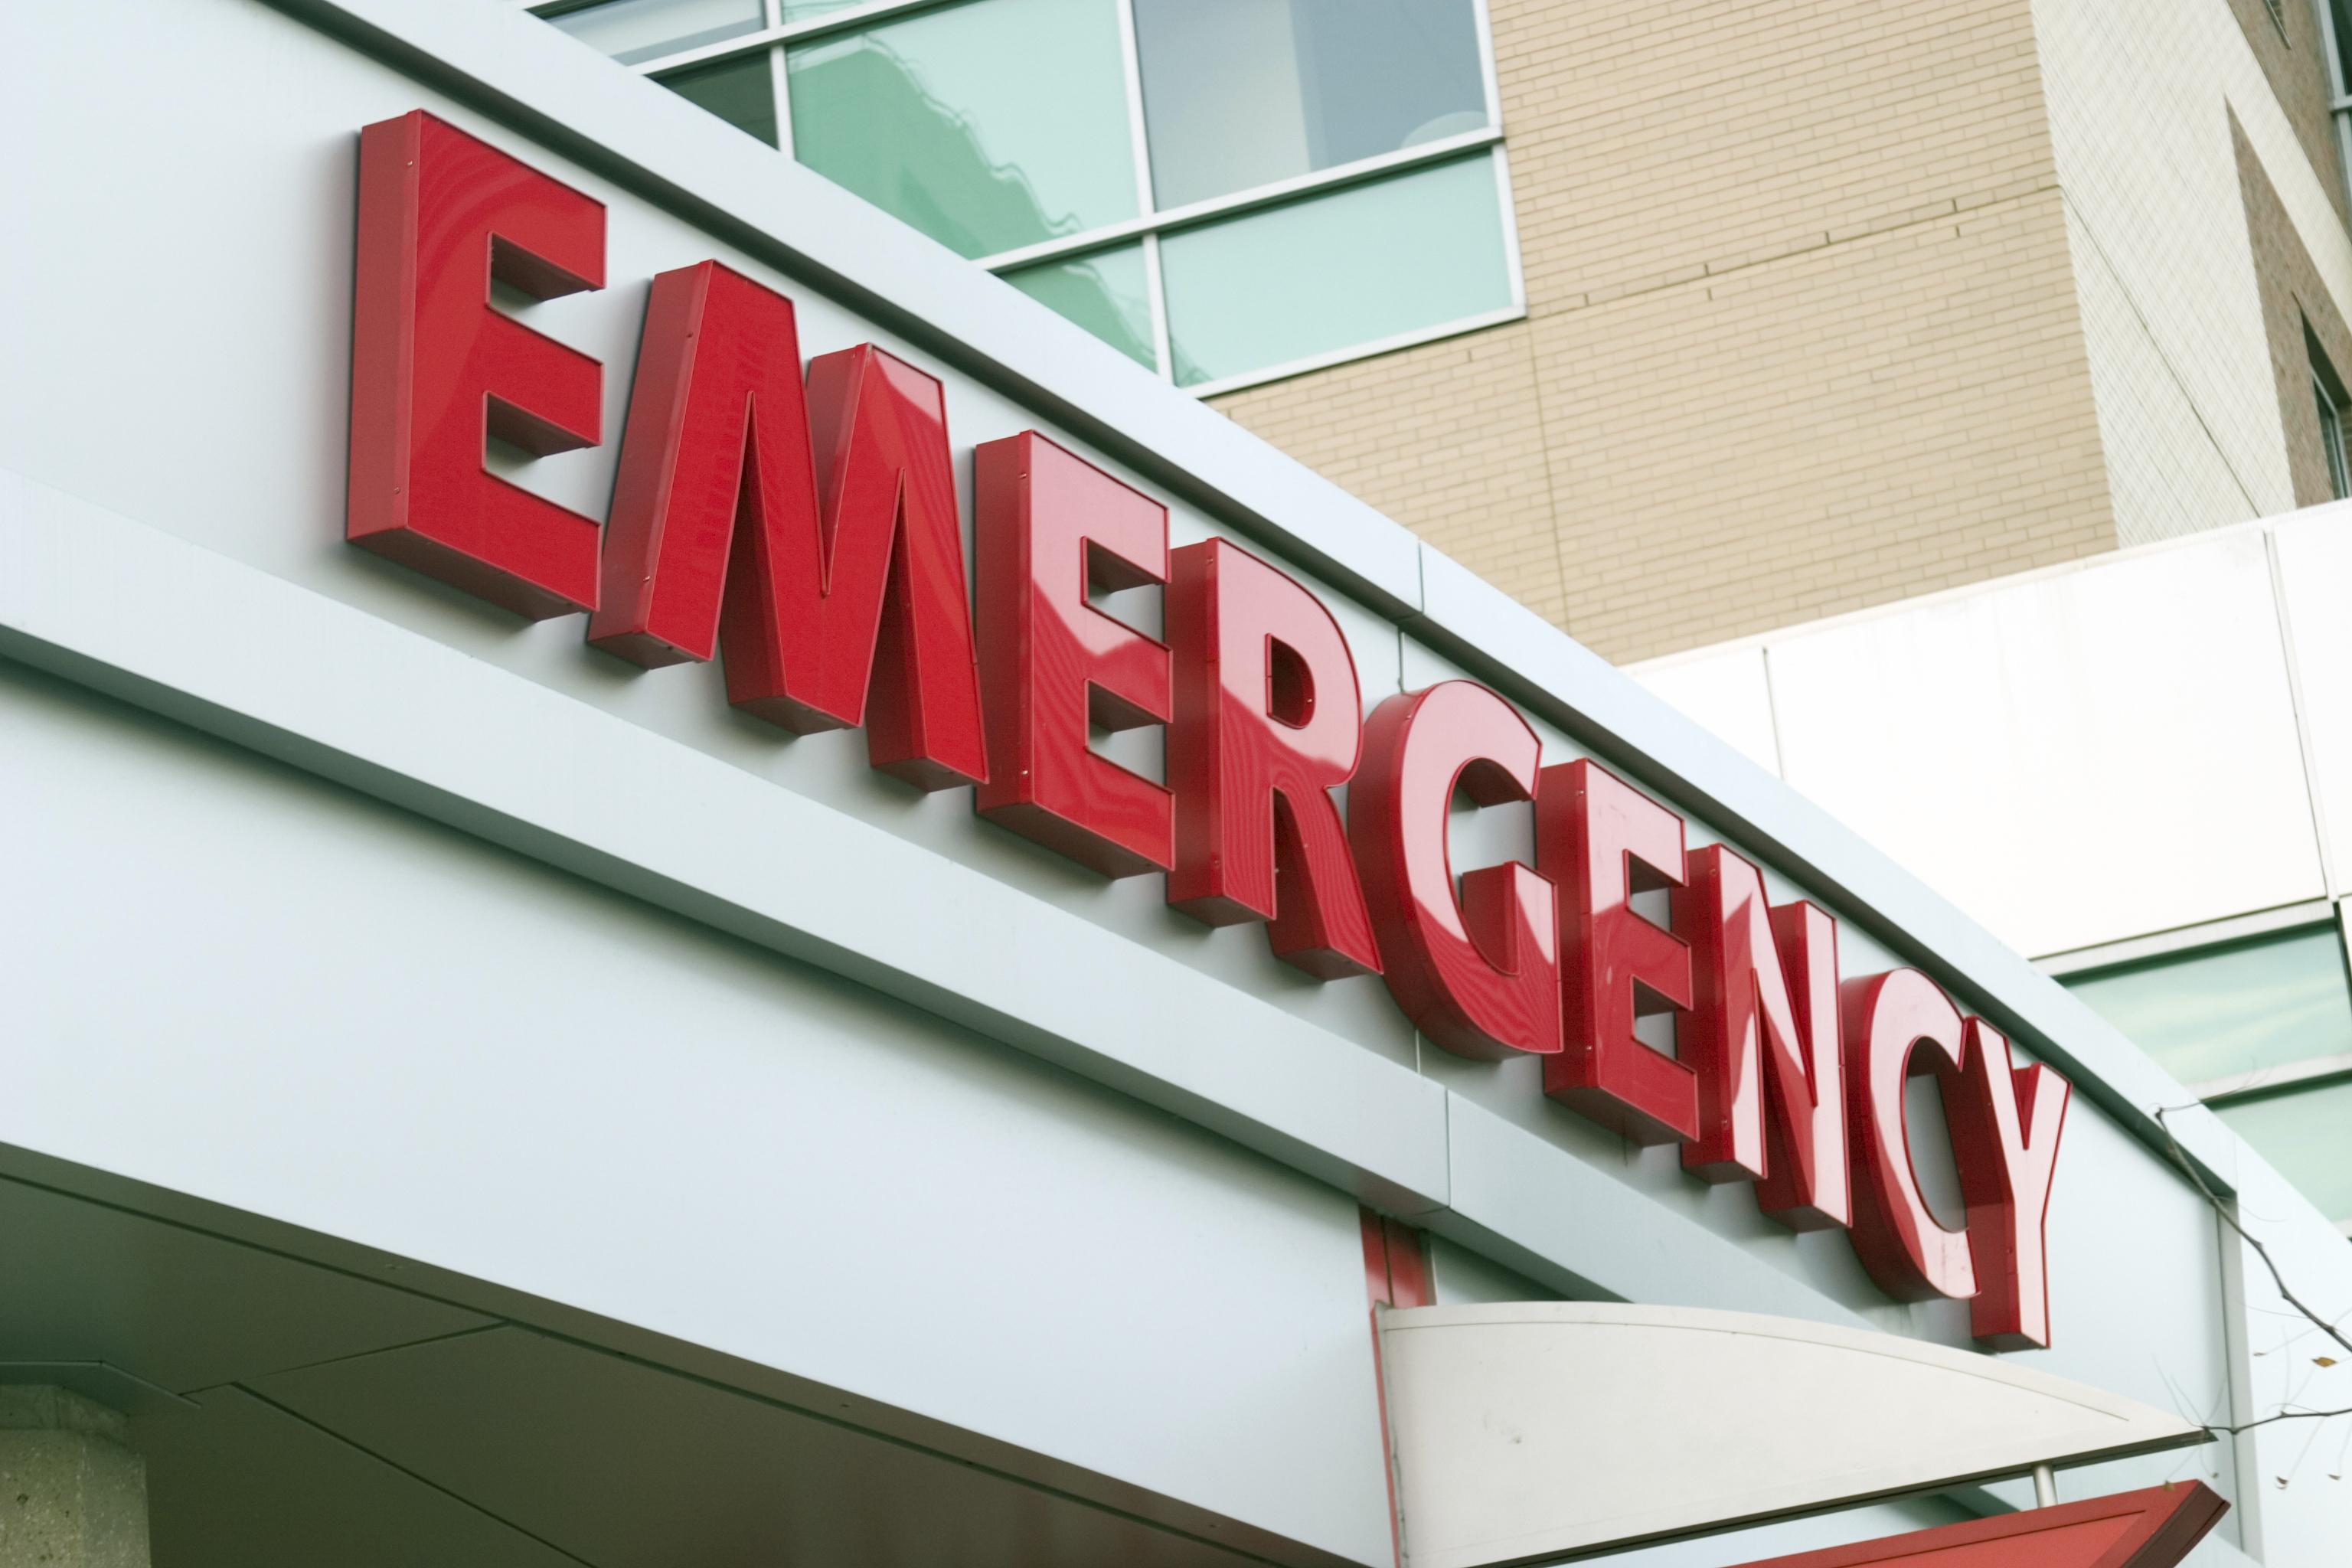 Atlanta Emergency Room Wait Times